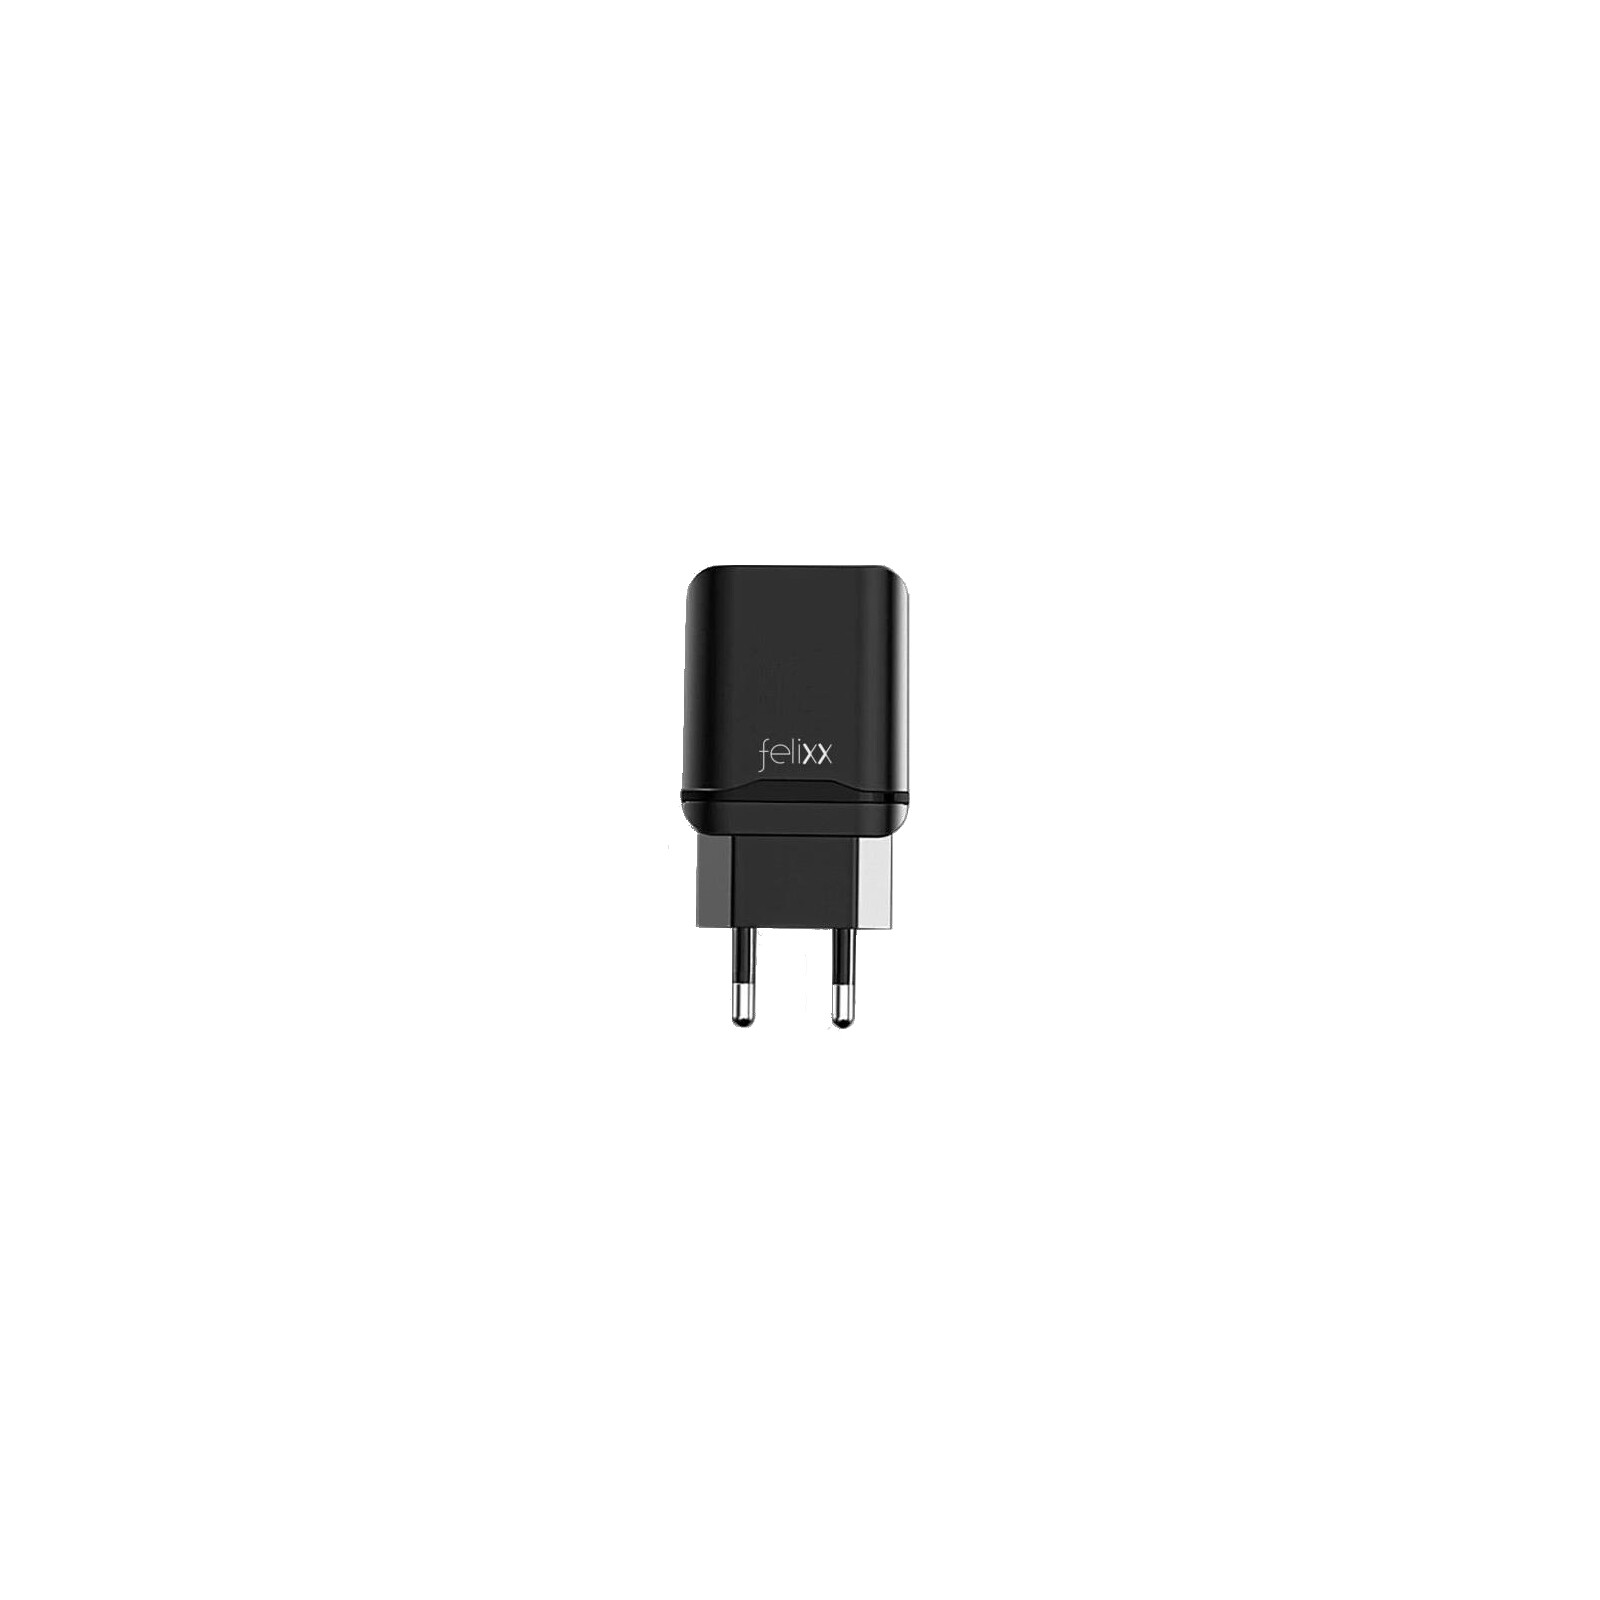 Felixx Reise-Schnellladegerät Qualcomm Quick Charge USB-C